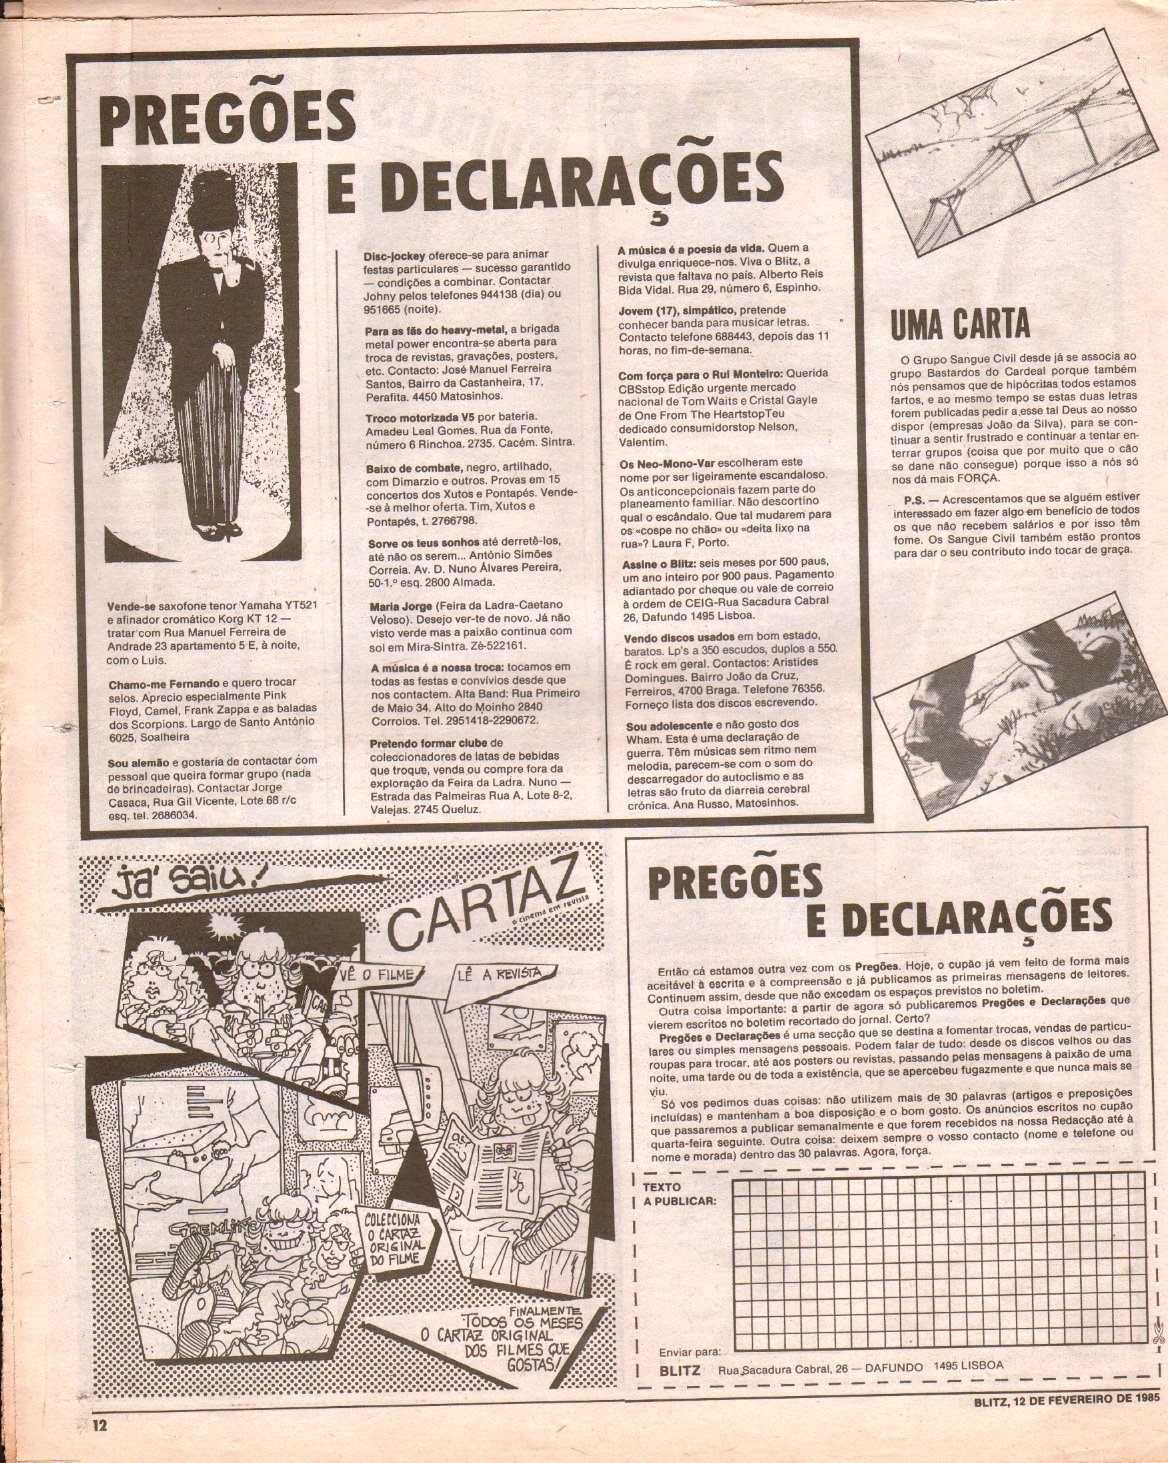 Blitz, dia 12 de fevereiro de 1982